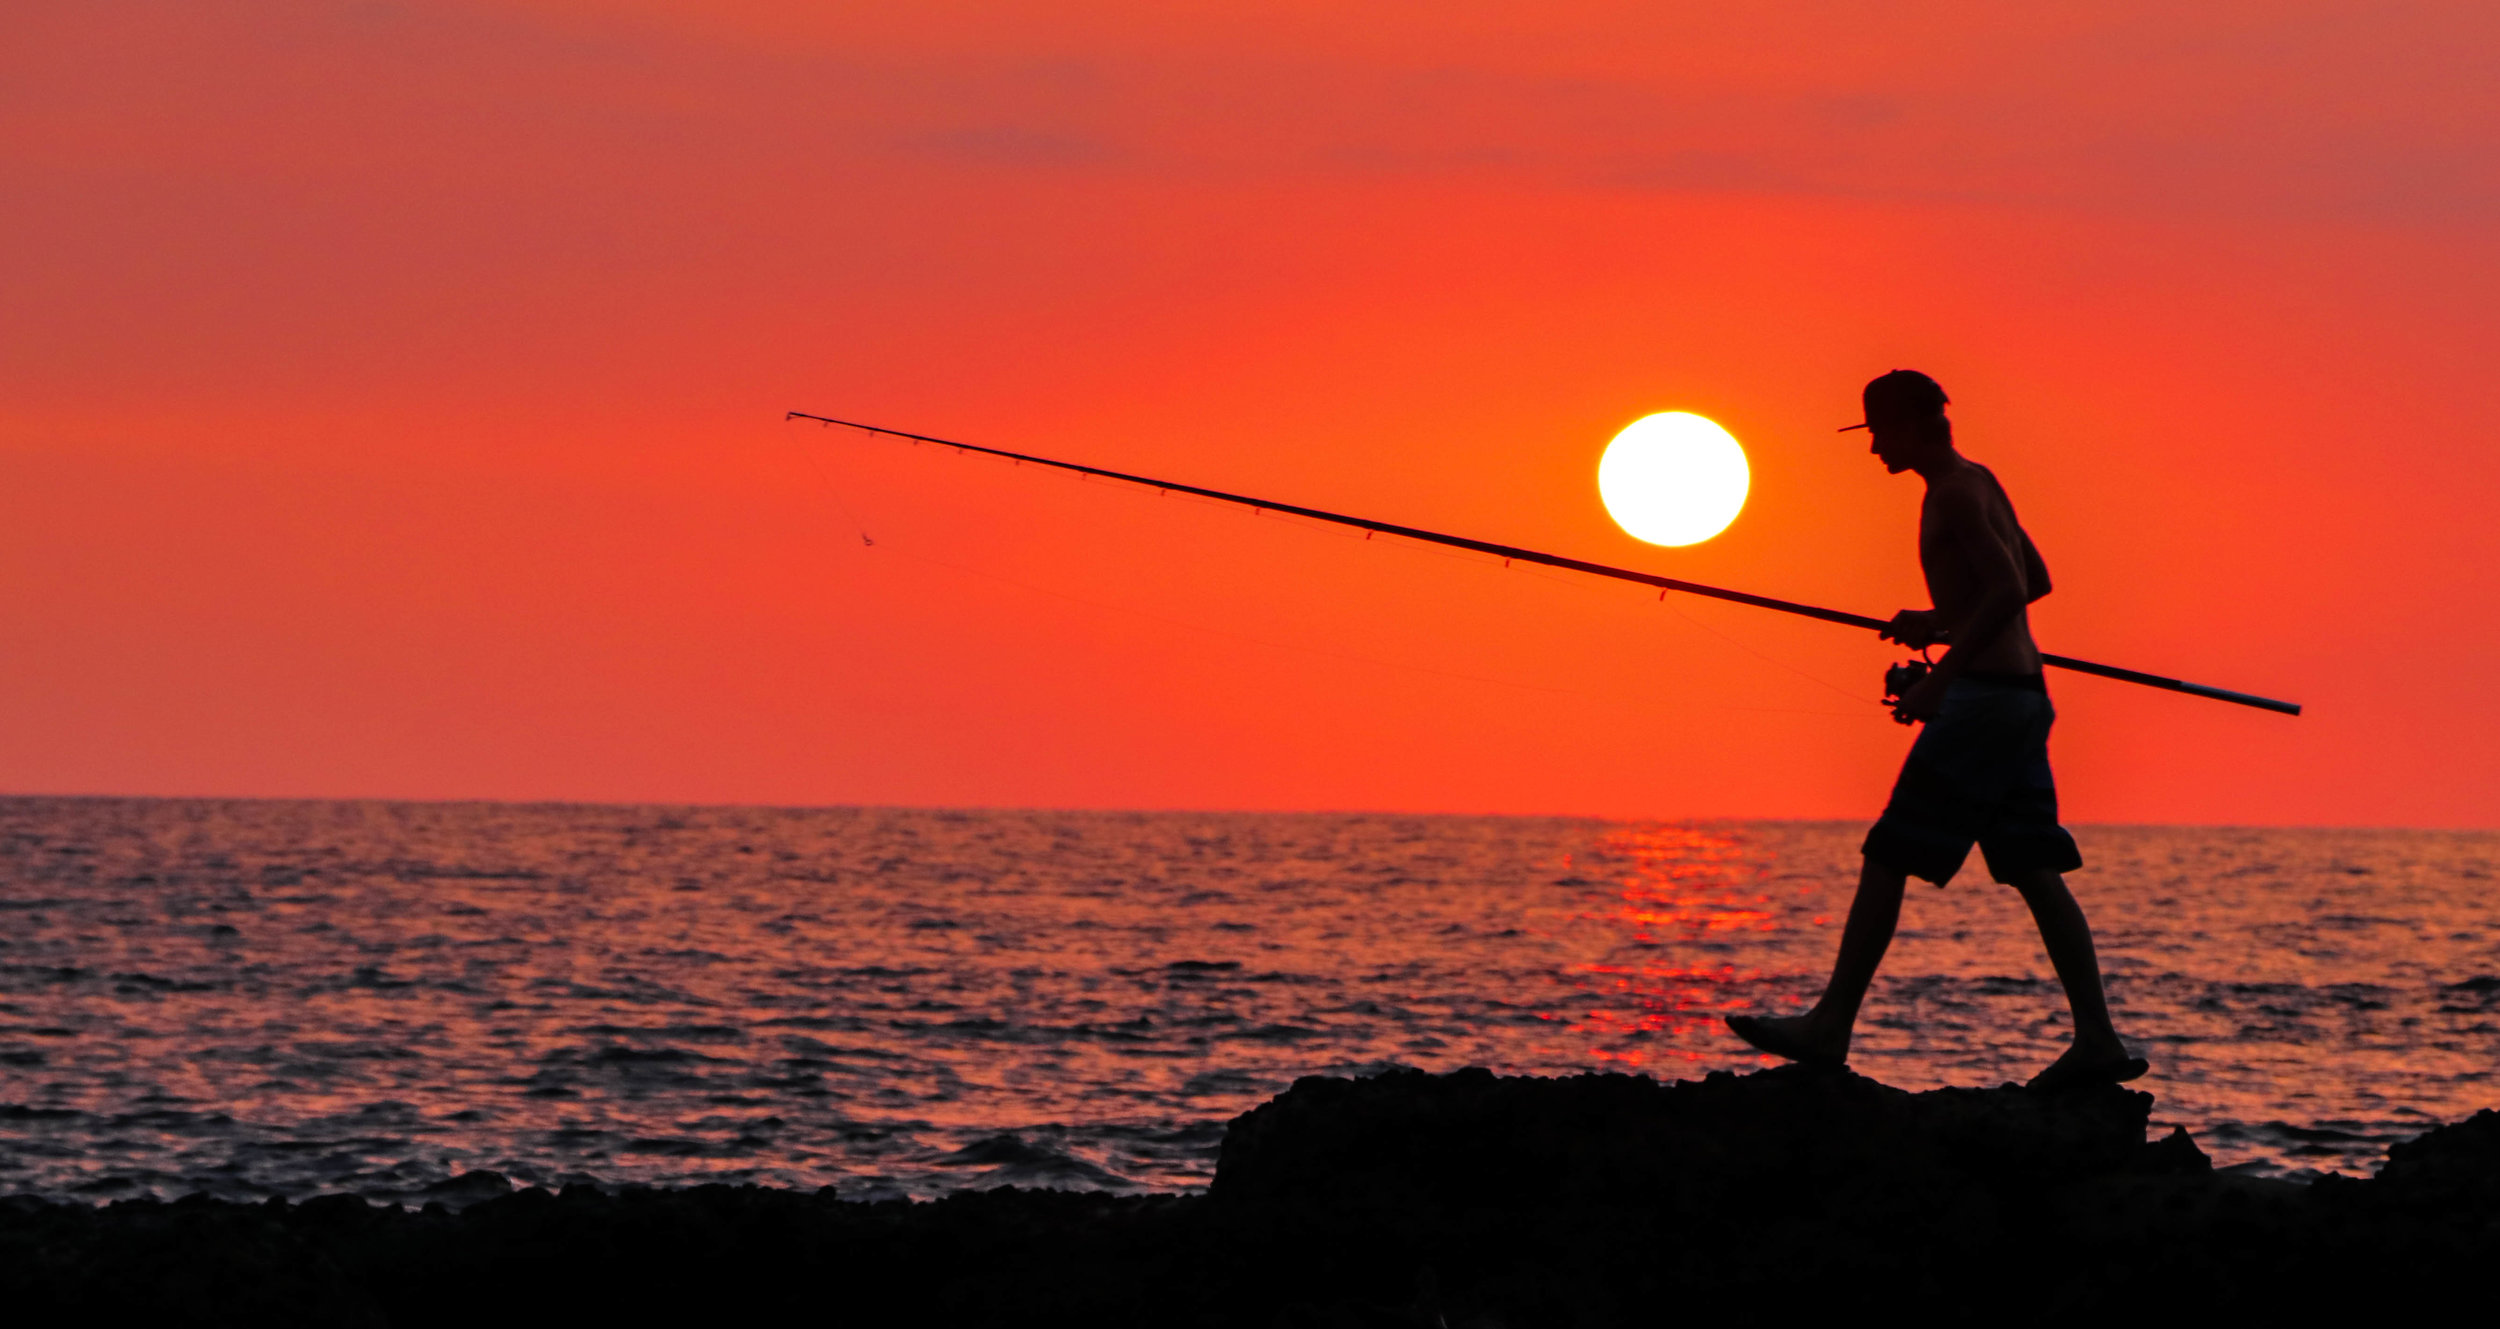 Sunset Fisherman - Big Island, HI